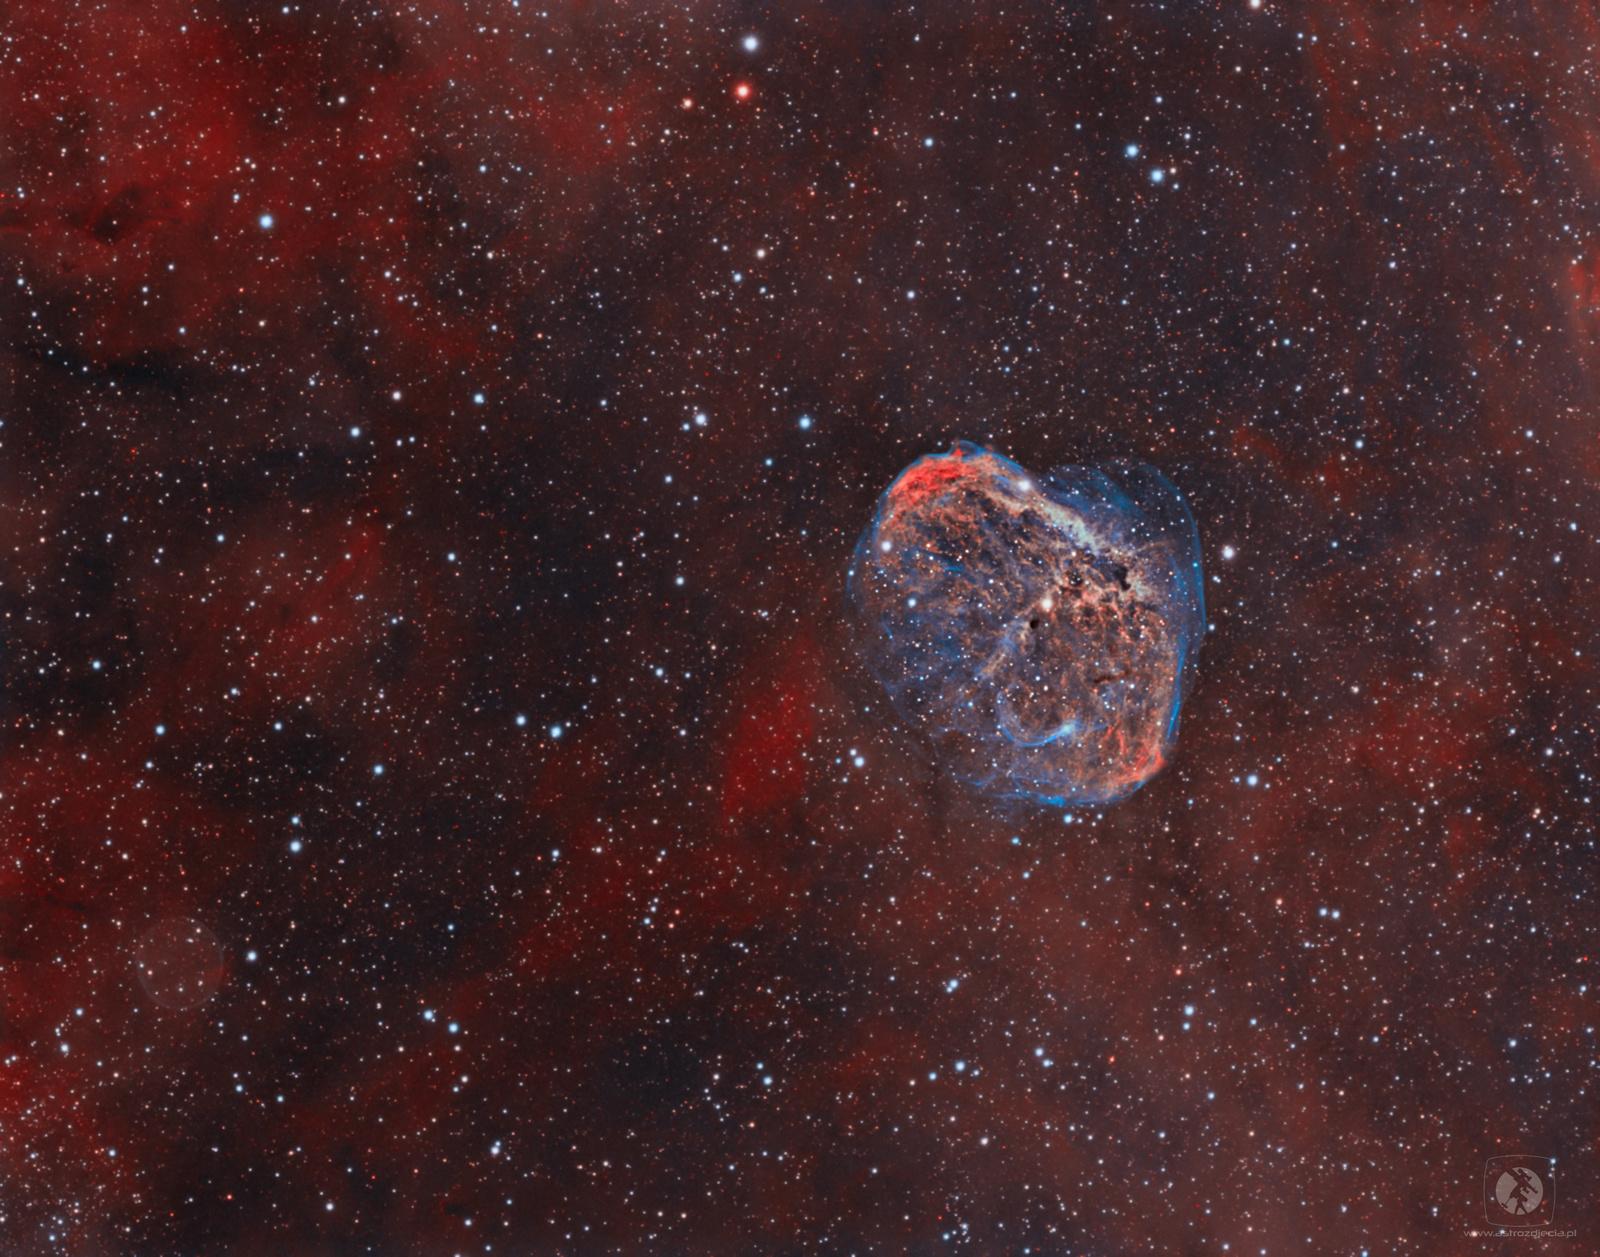 NGC6888.thumb.jpg.d7debe1617c2ee4b414d2a545e8d0f6f.jpg